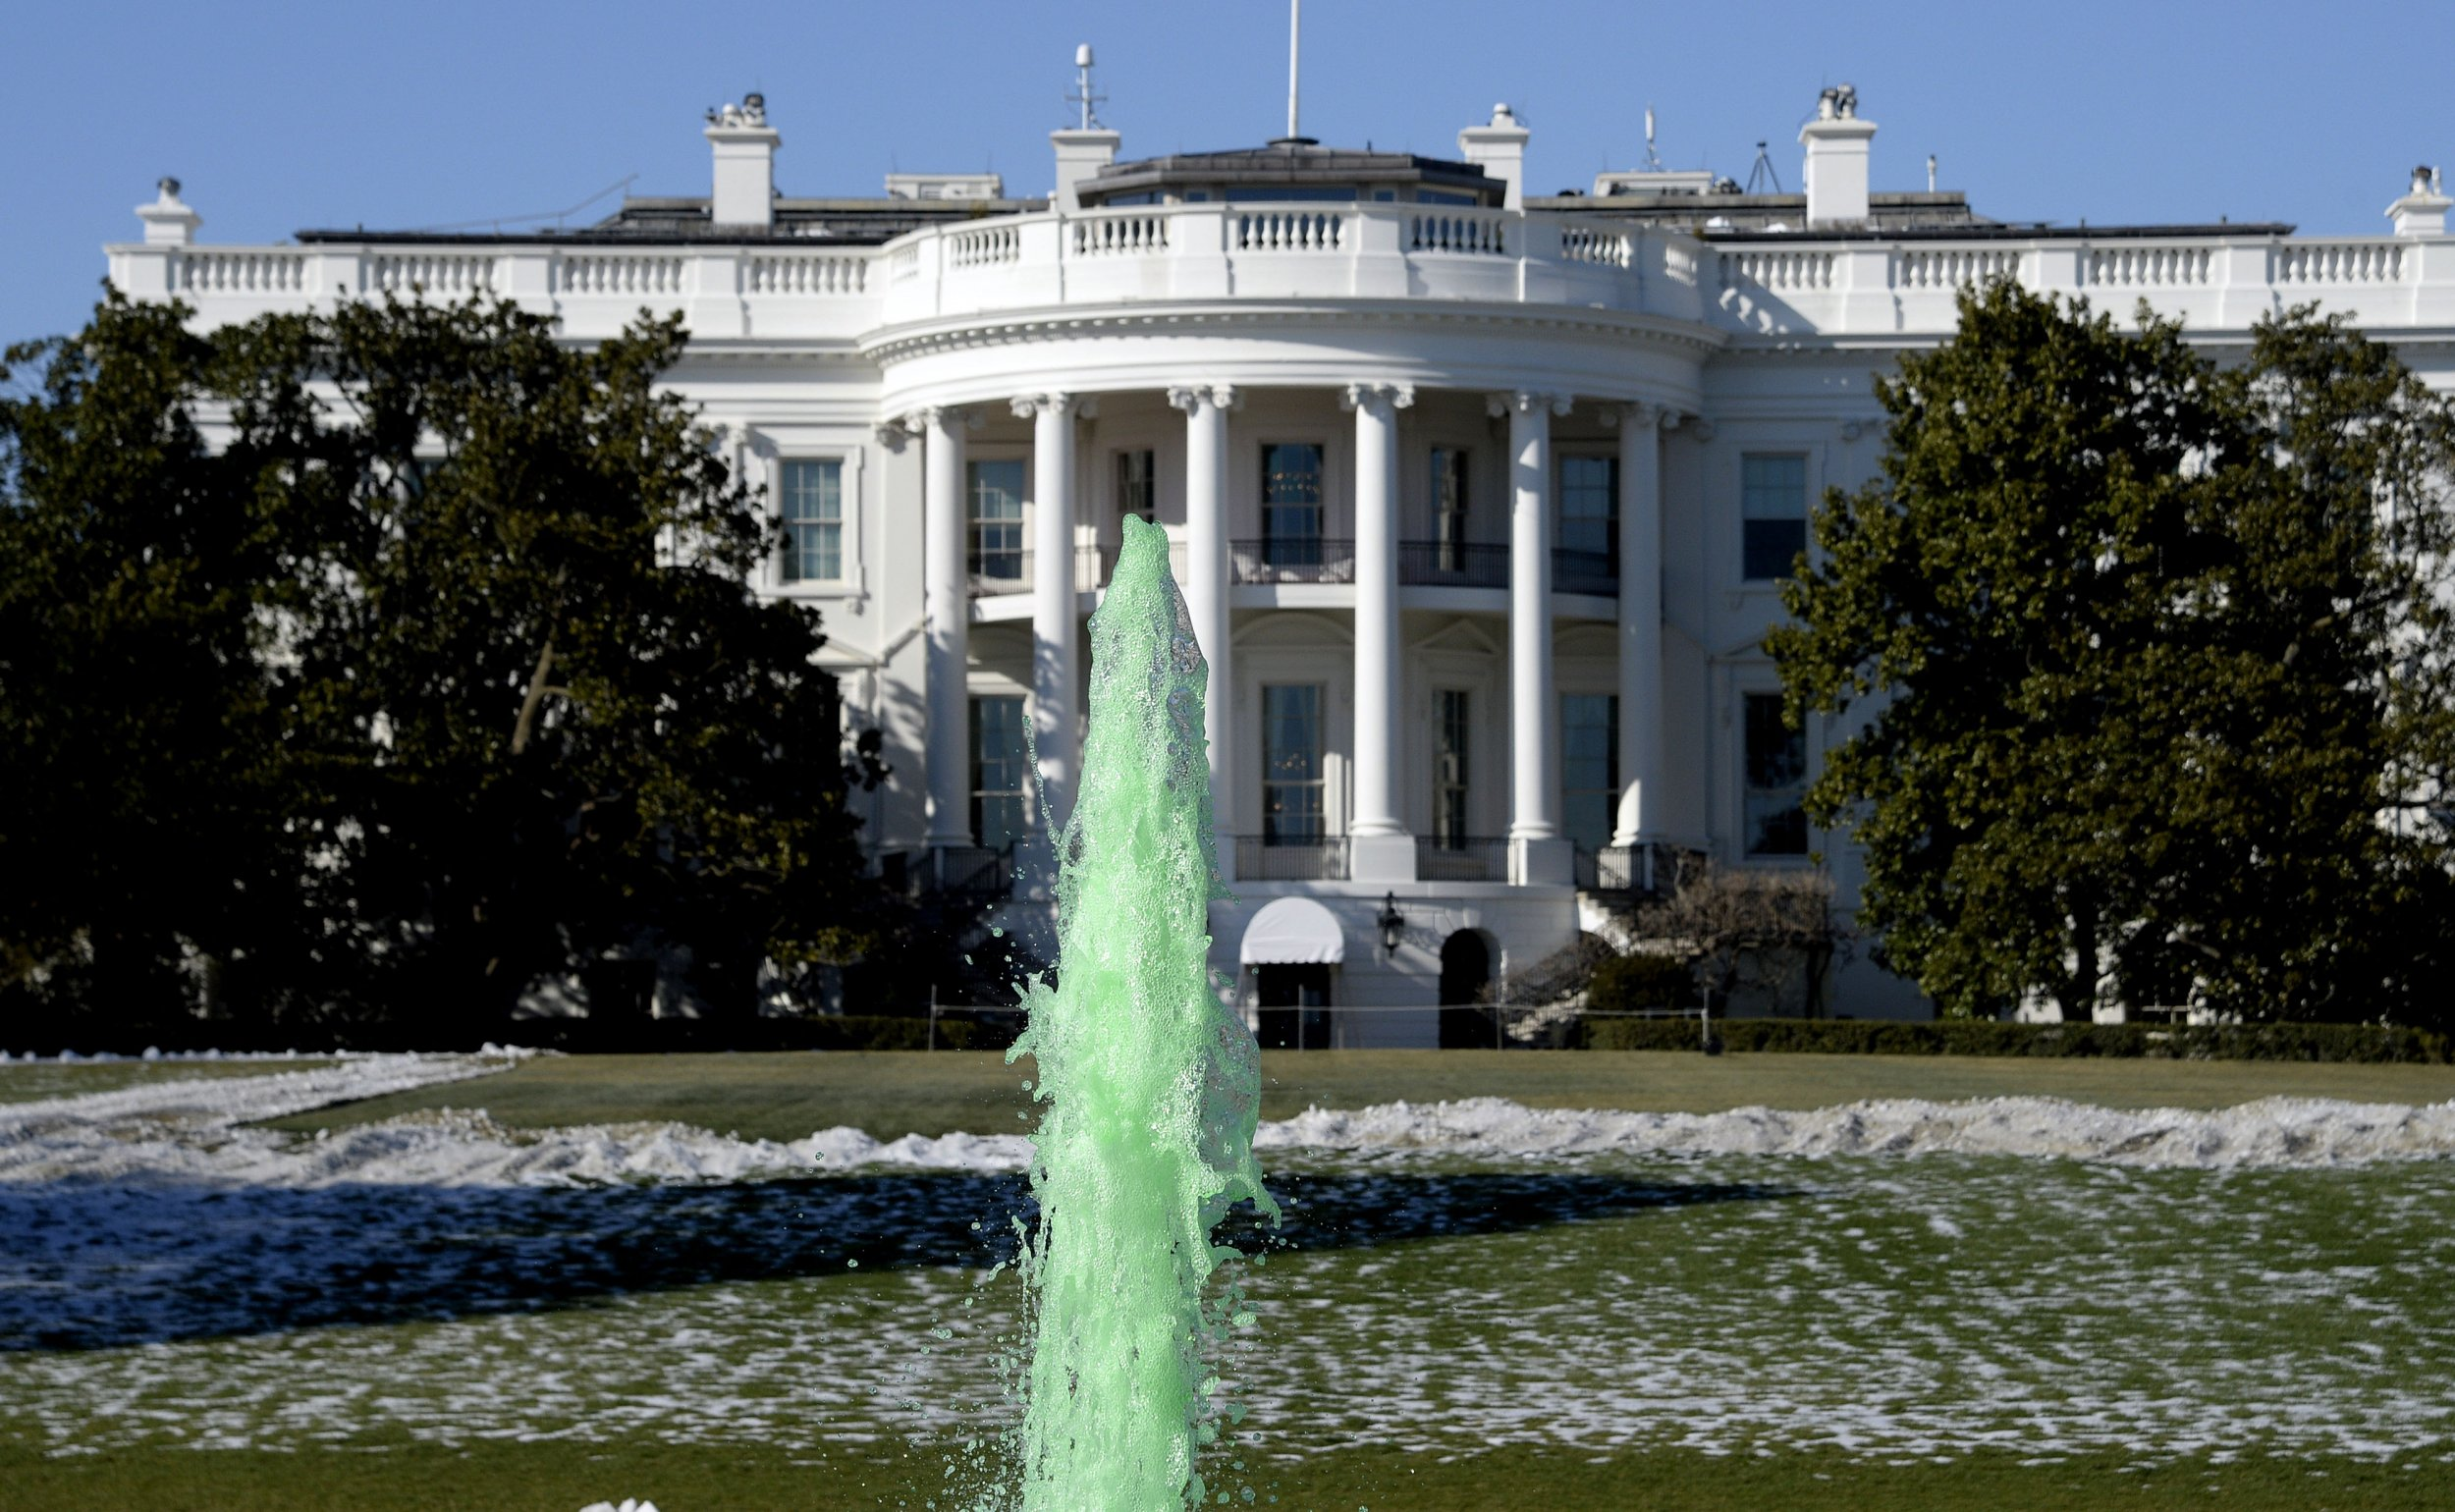 white house green fountain st. patrick's day michelle obama